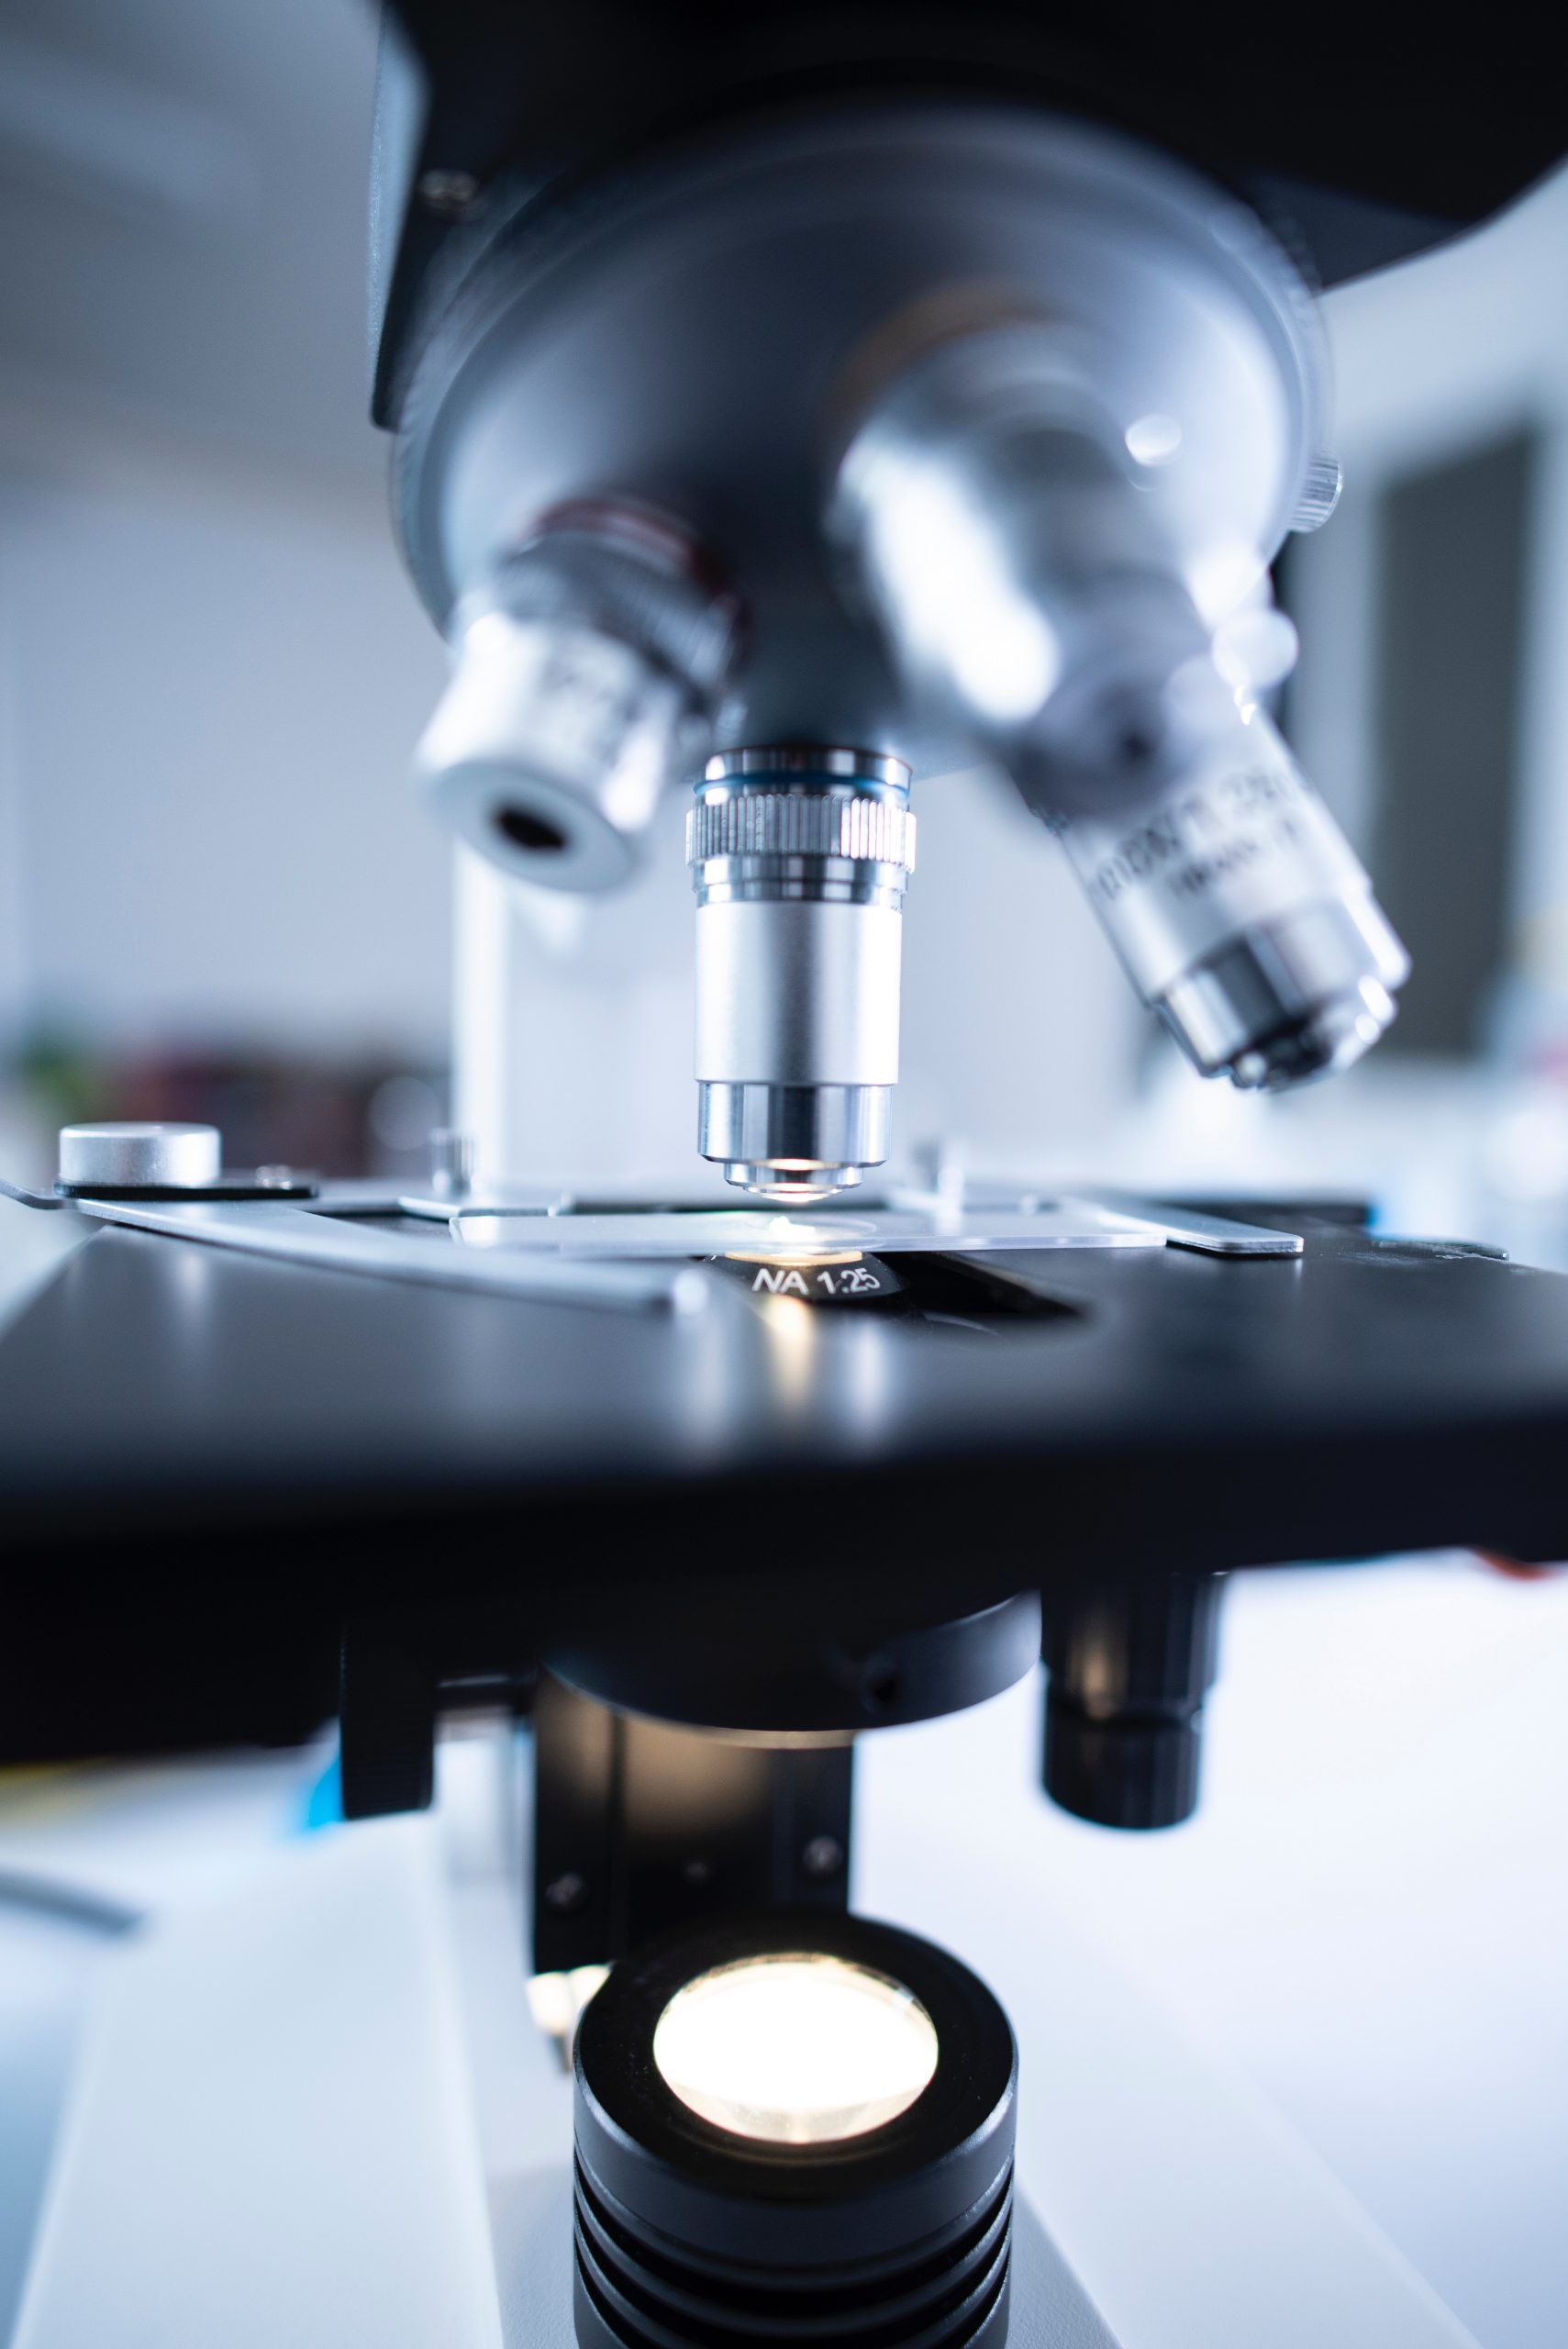 Natural Sciences Courses You'll Take at Florida National University